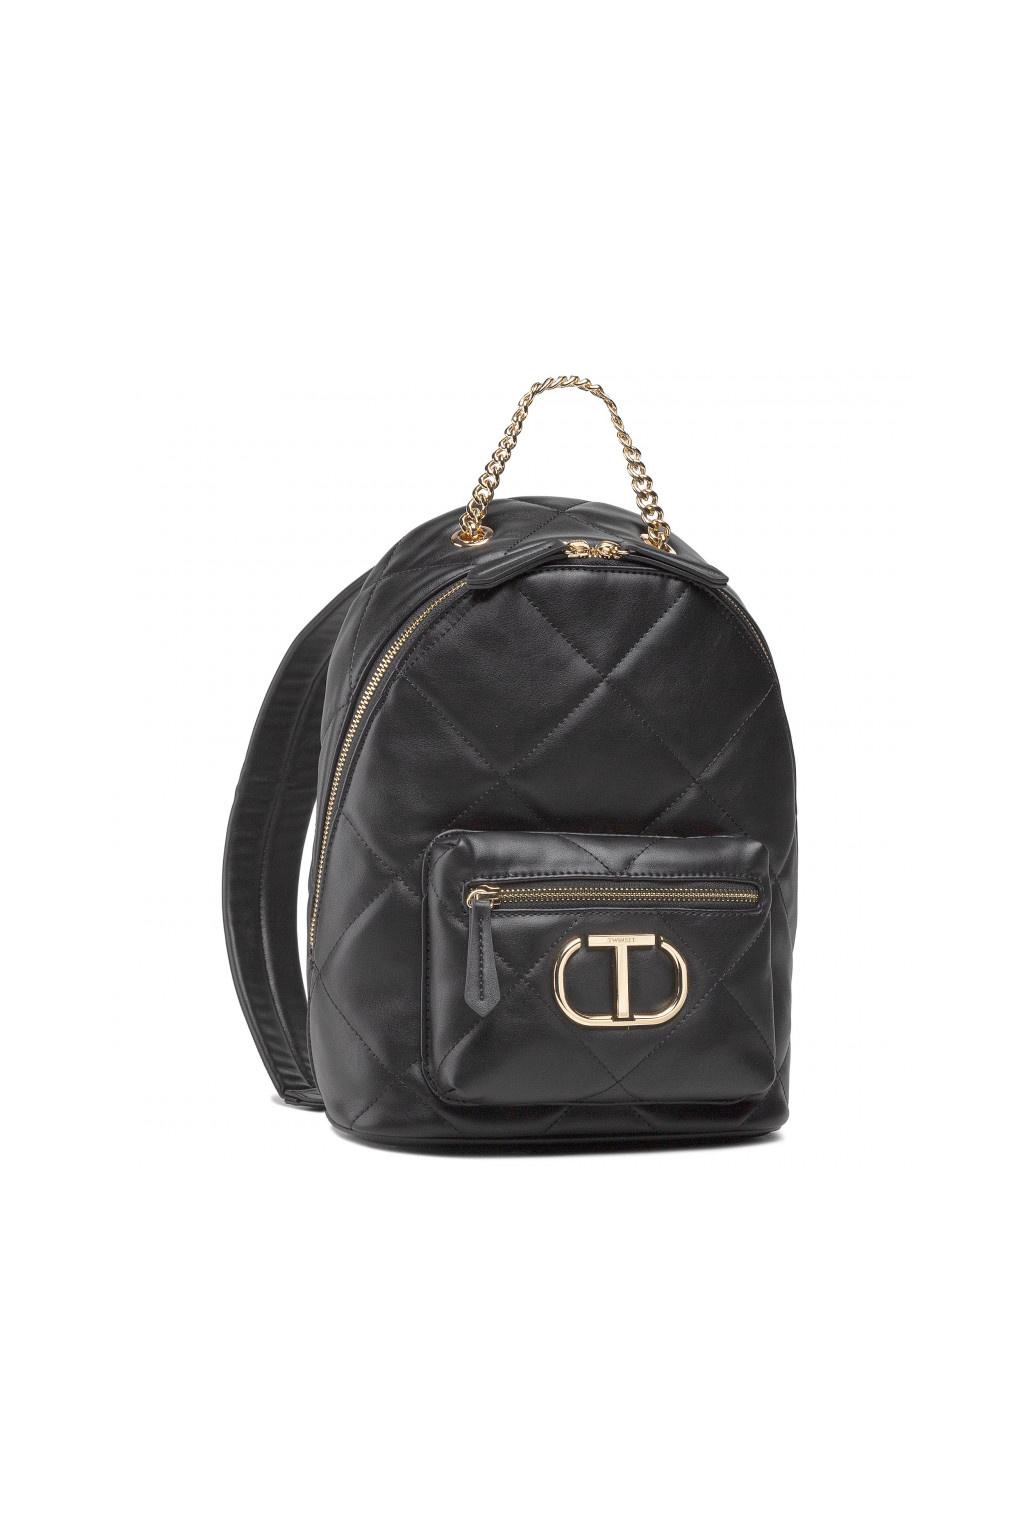 Dámský batoh Twinset Zaino 211TD8072 černý